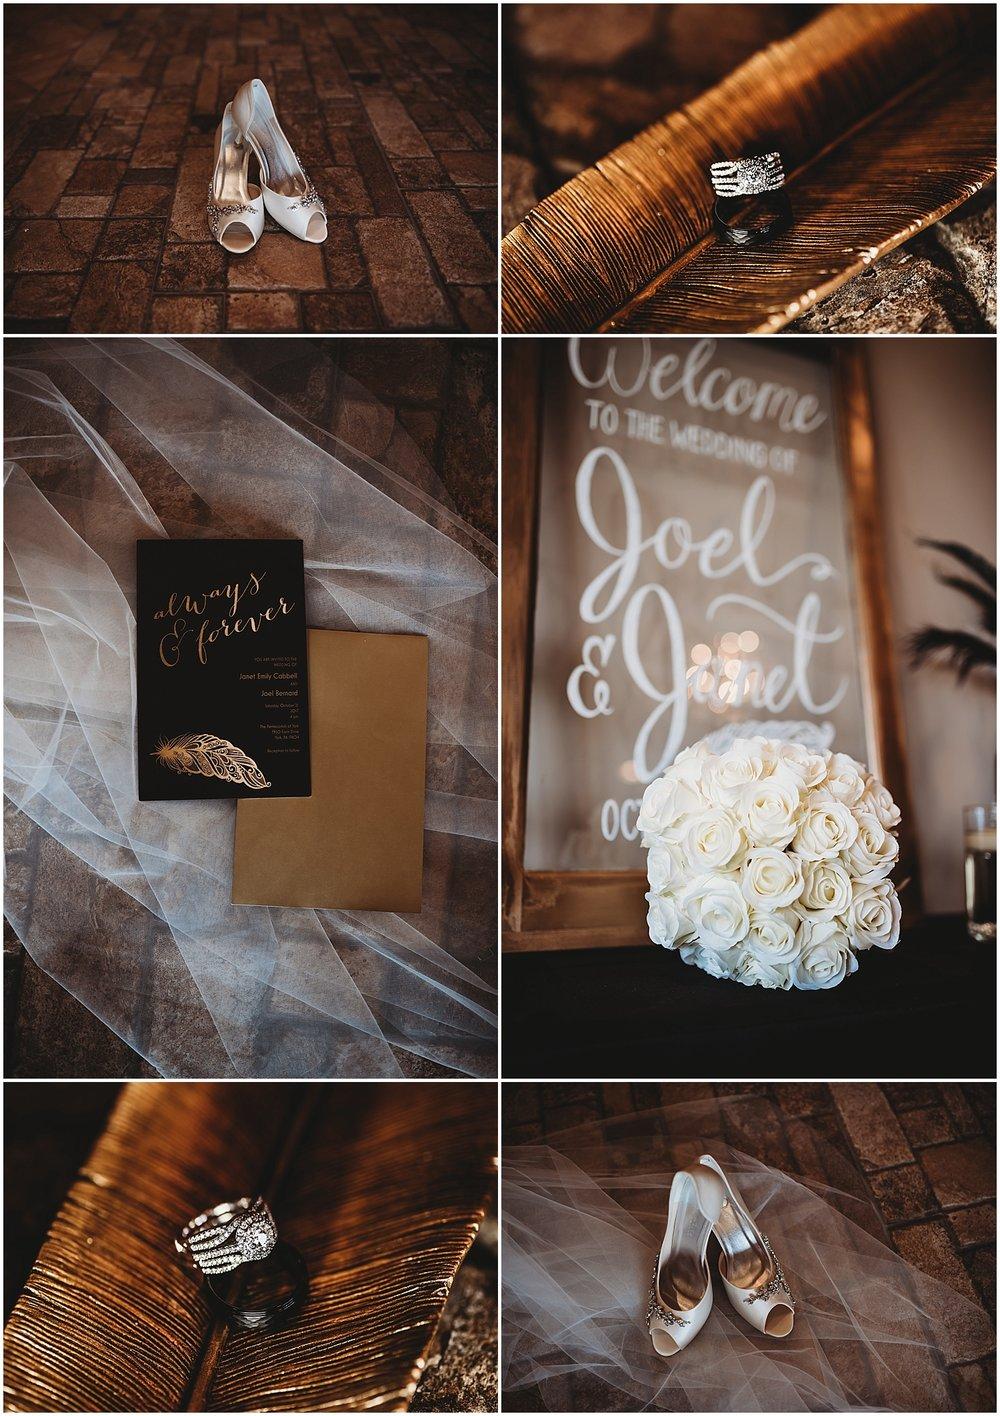 NEPA-Scranton-wedding-engagement-photographer-in-York-PA-Central-PA_0103.jpg